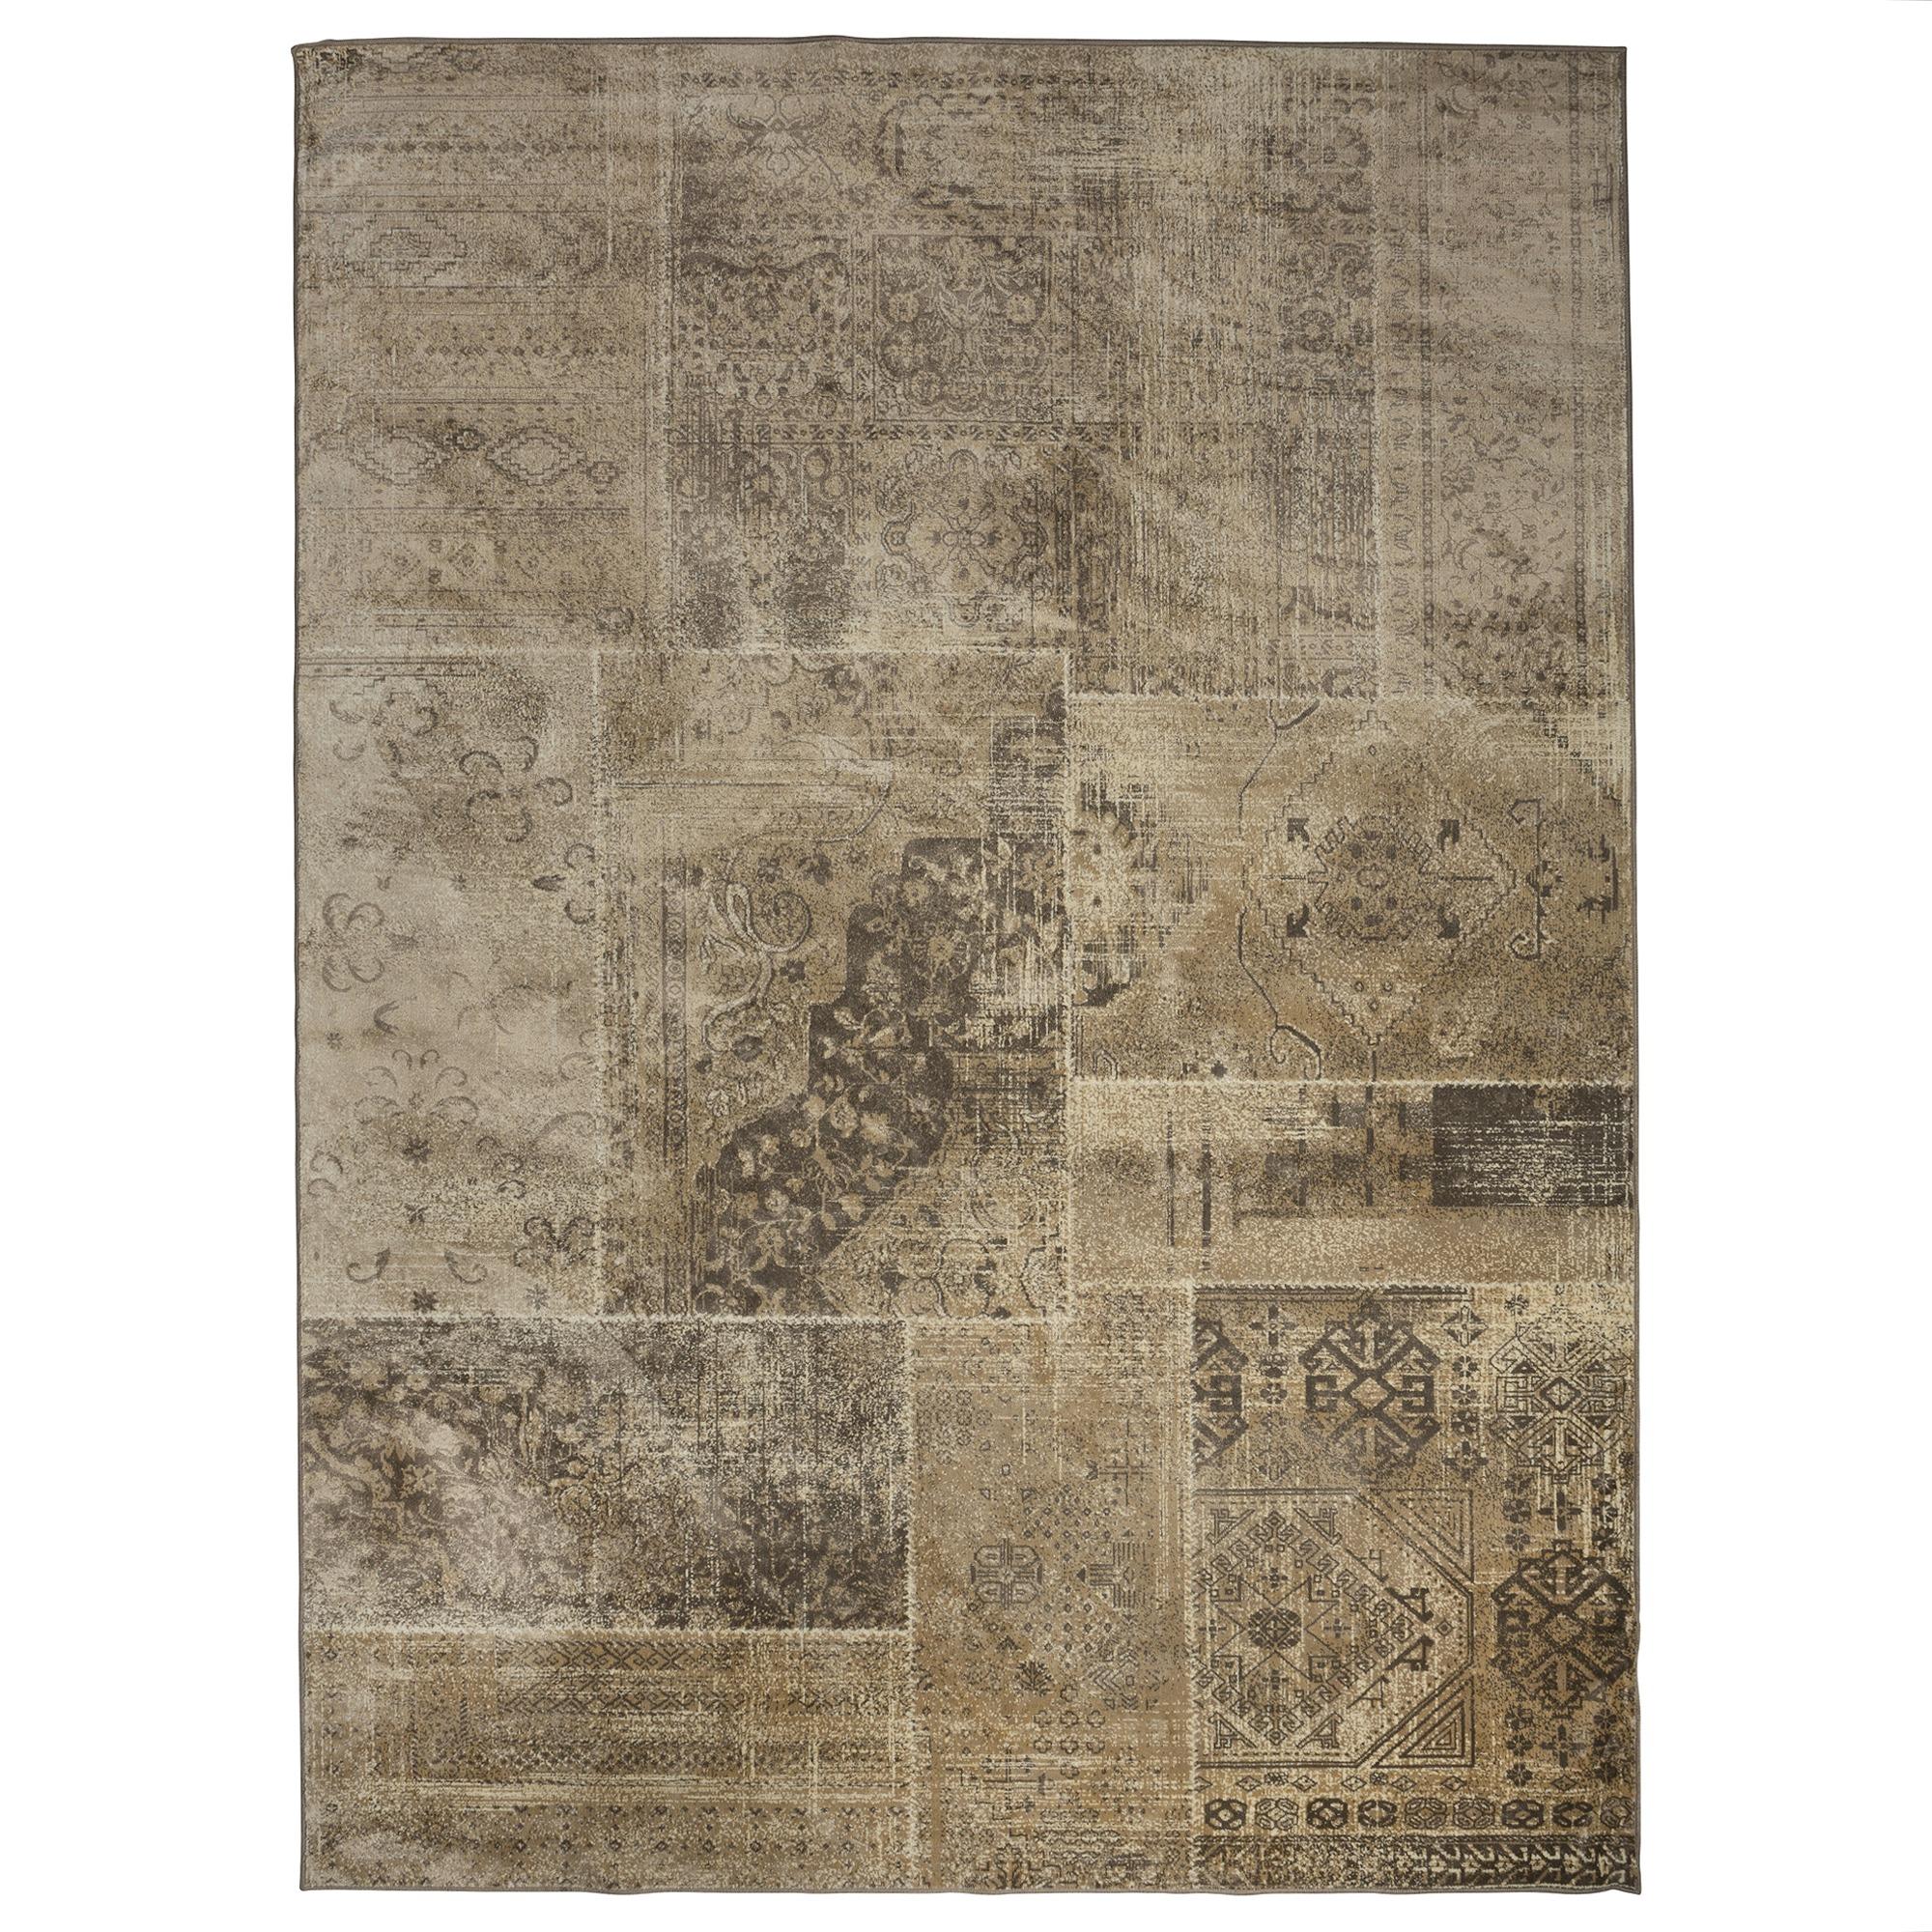 Vloerkleed Florence beige 170x240 cm